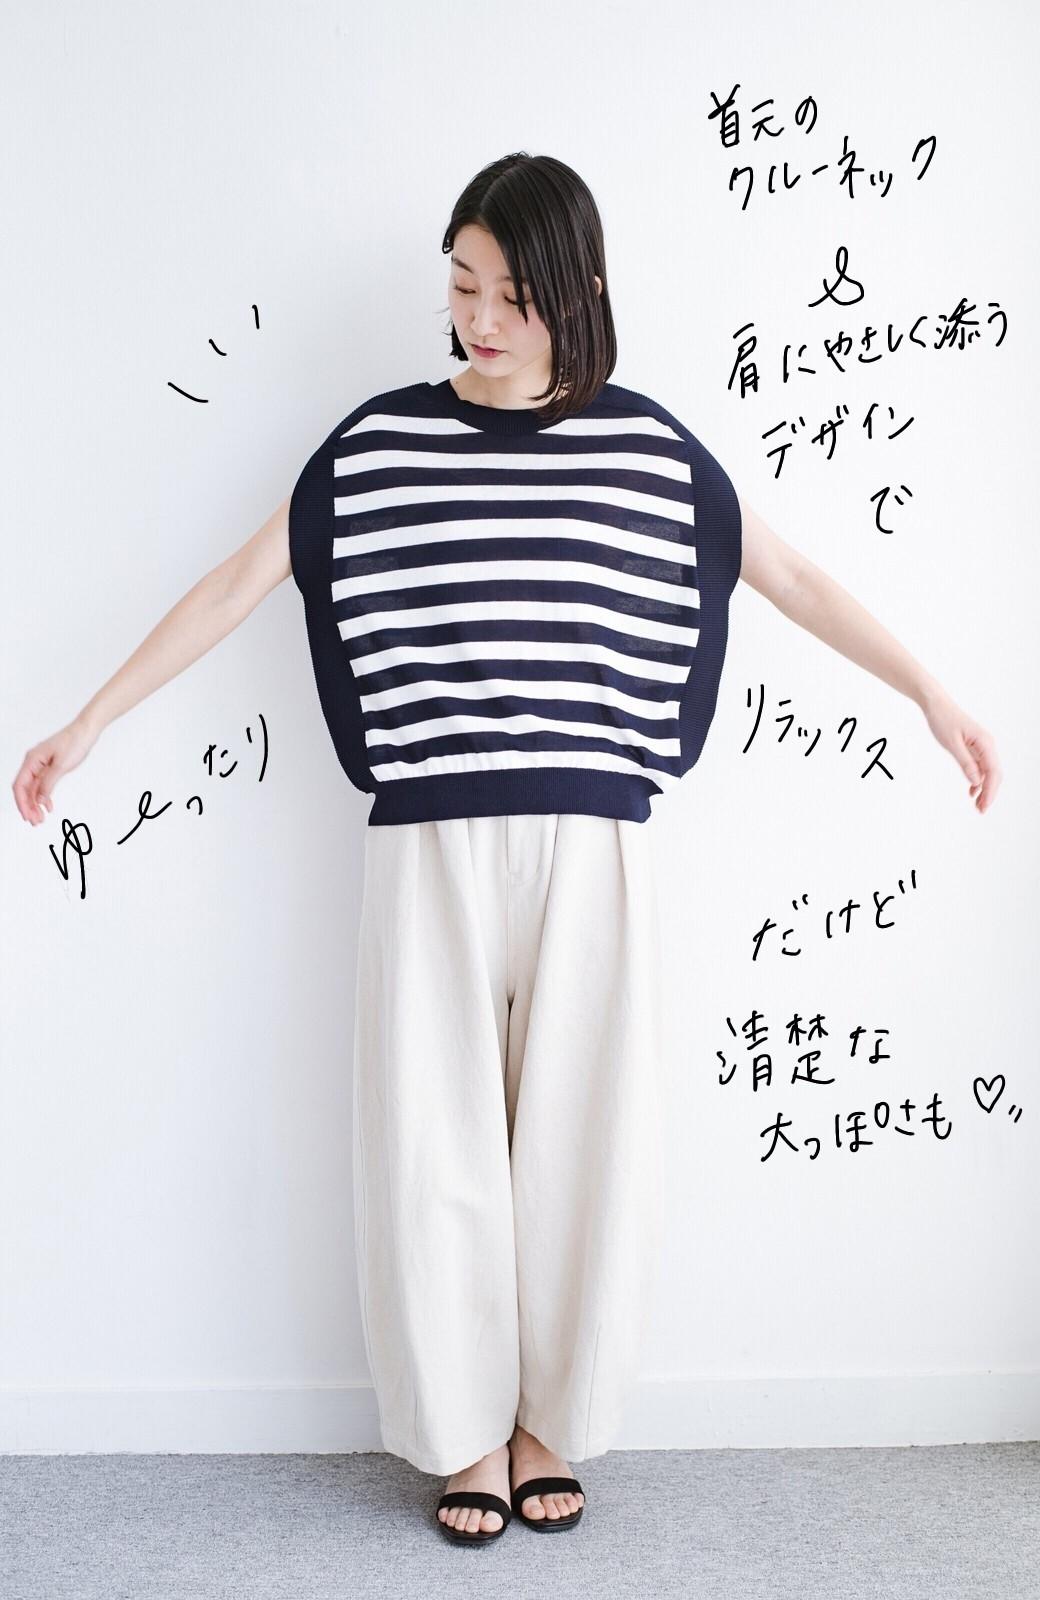 haco! カットソー感覚で着られる 洗えるオトナニットトップス by MAKORI <ブルー系その他>の商品写真7